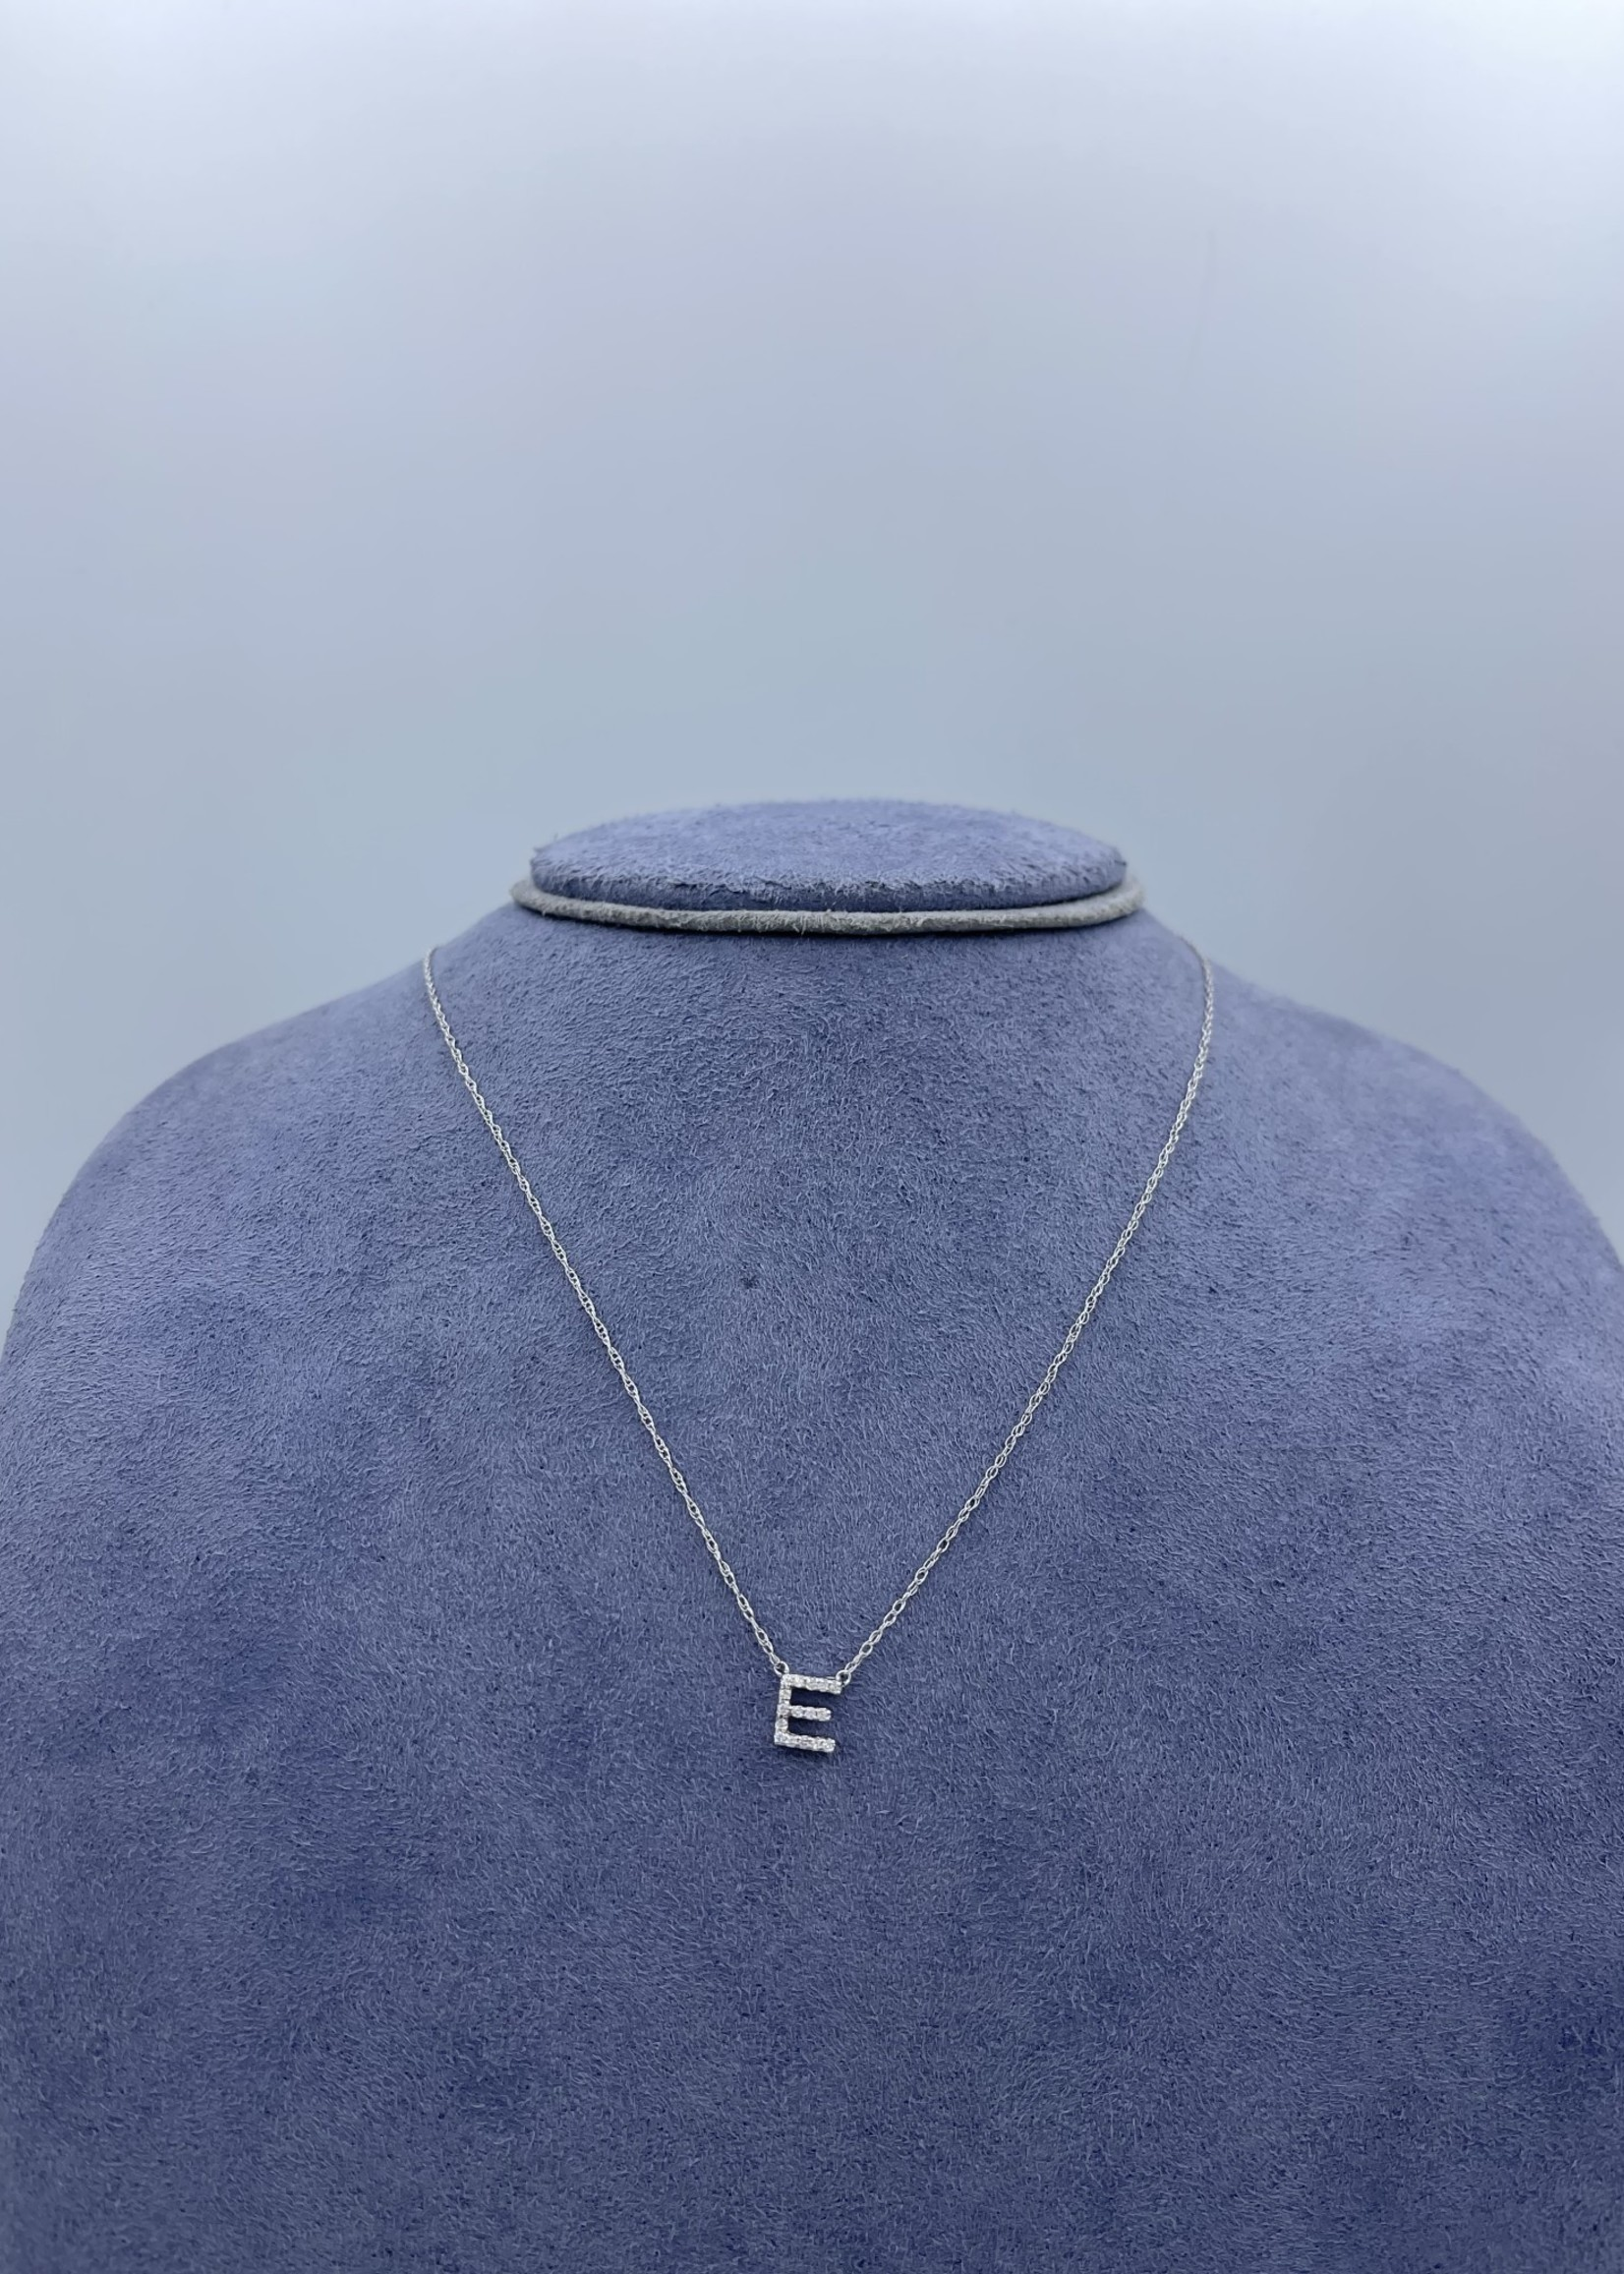 Overnight Diamond Initial Necklace 18' 14k White